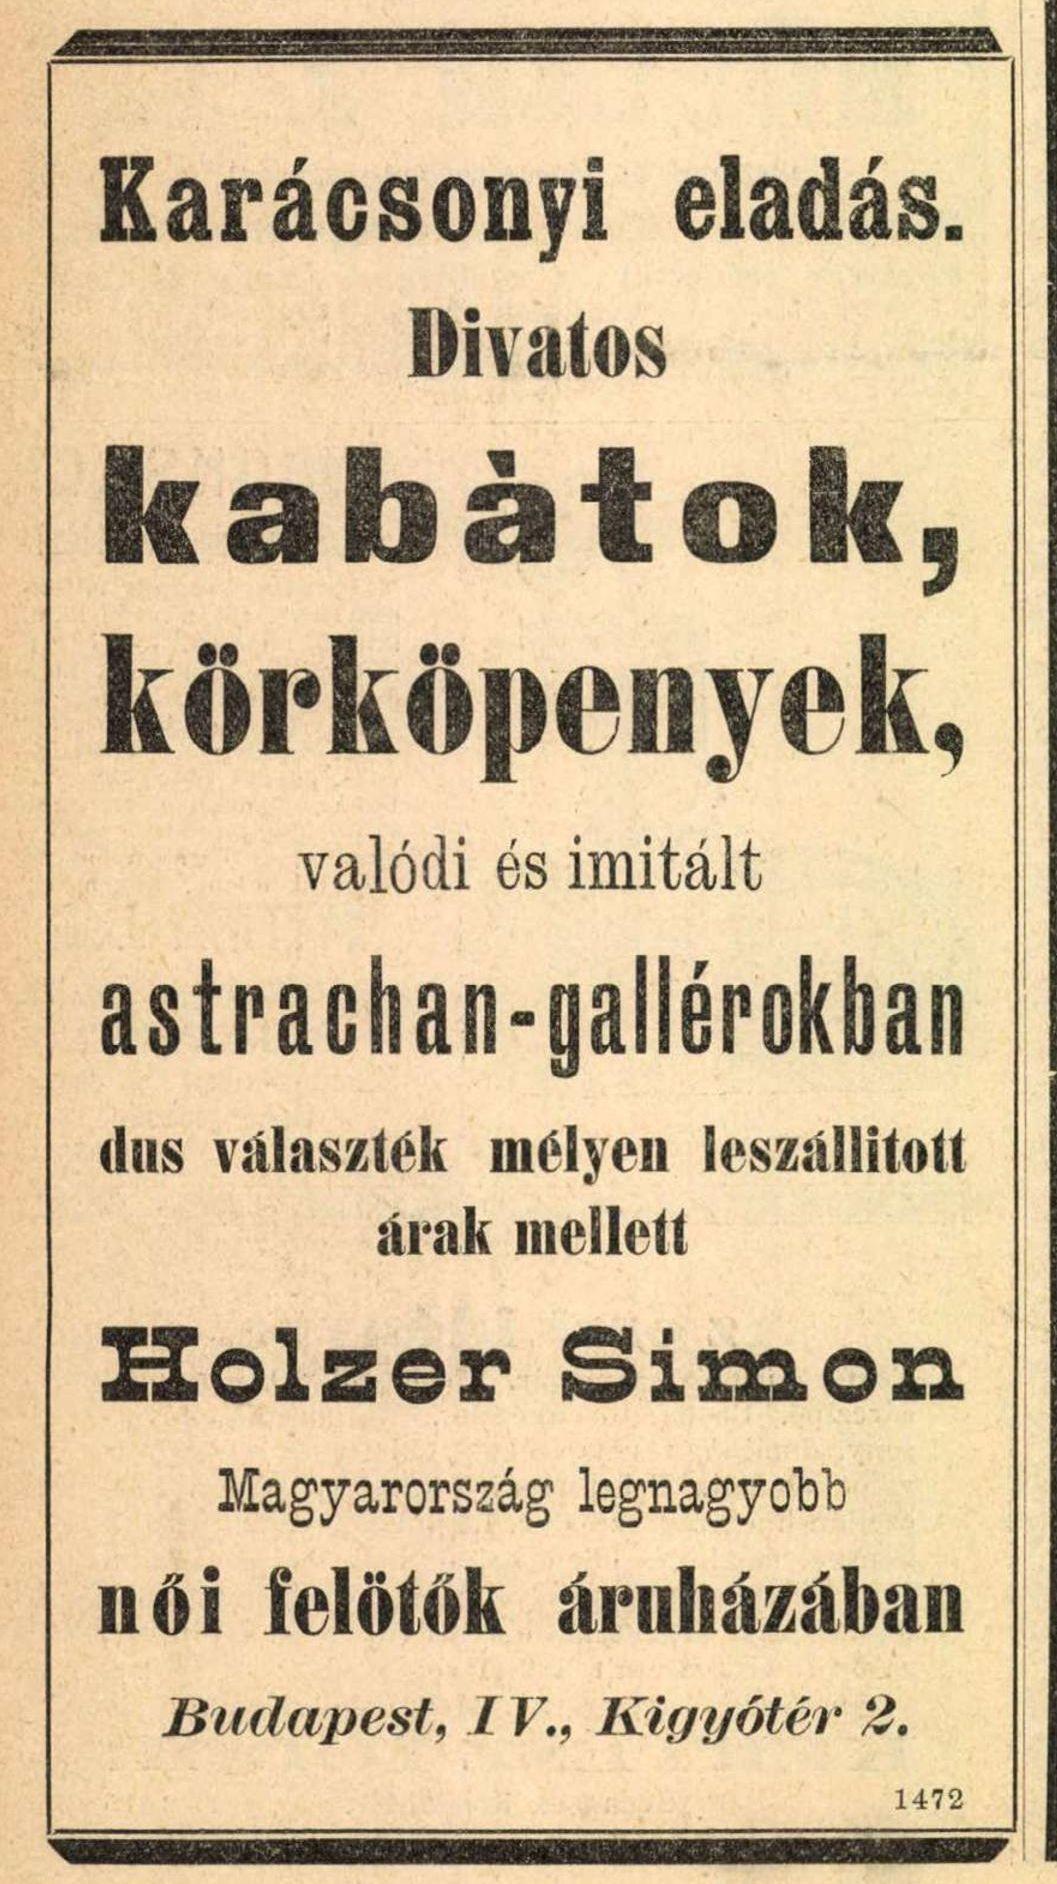 noiruha_borsszemjanko_1894-1539845698_pages856-856-page-001.jpg